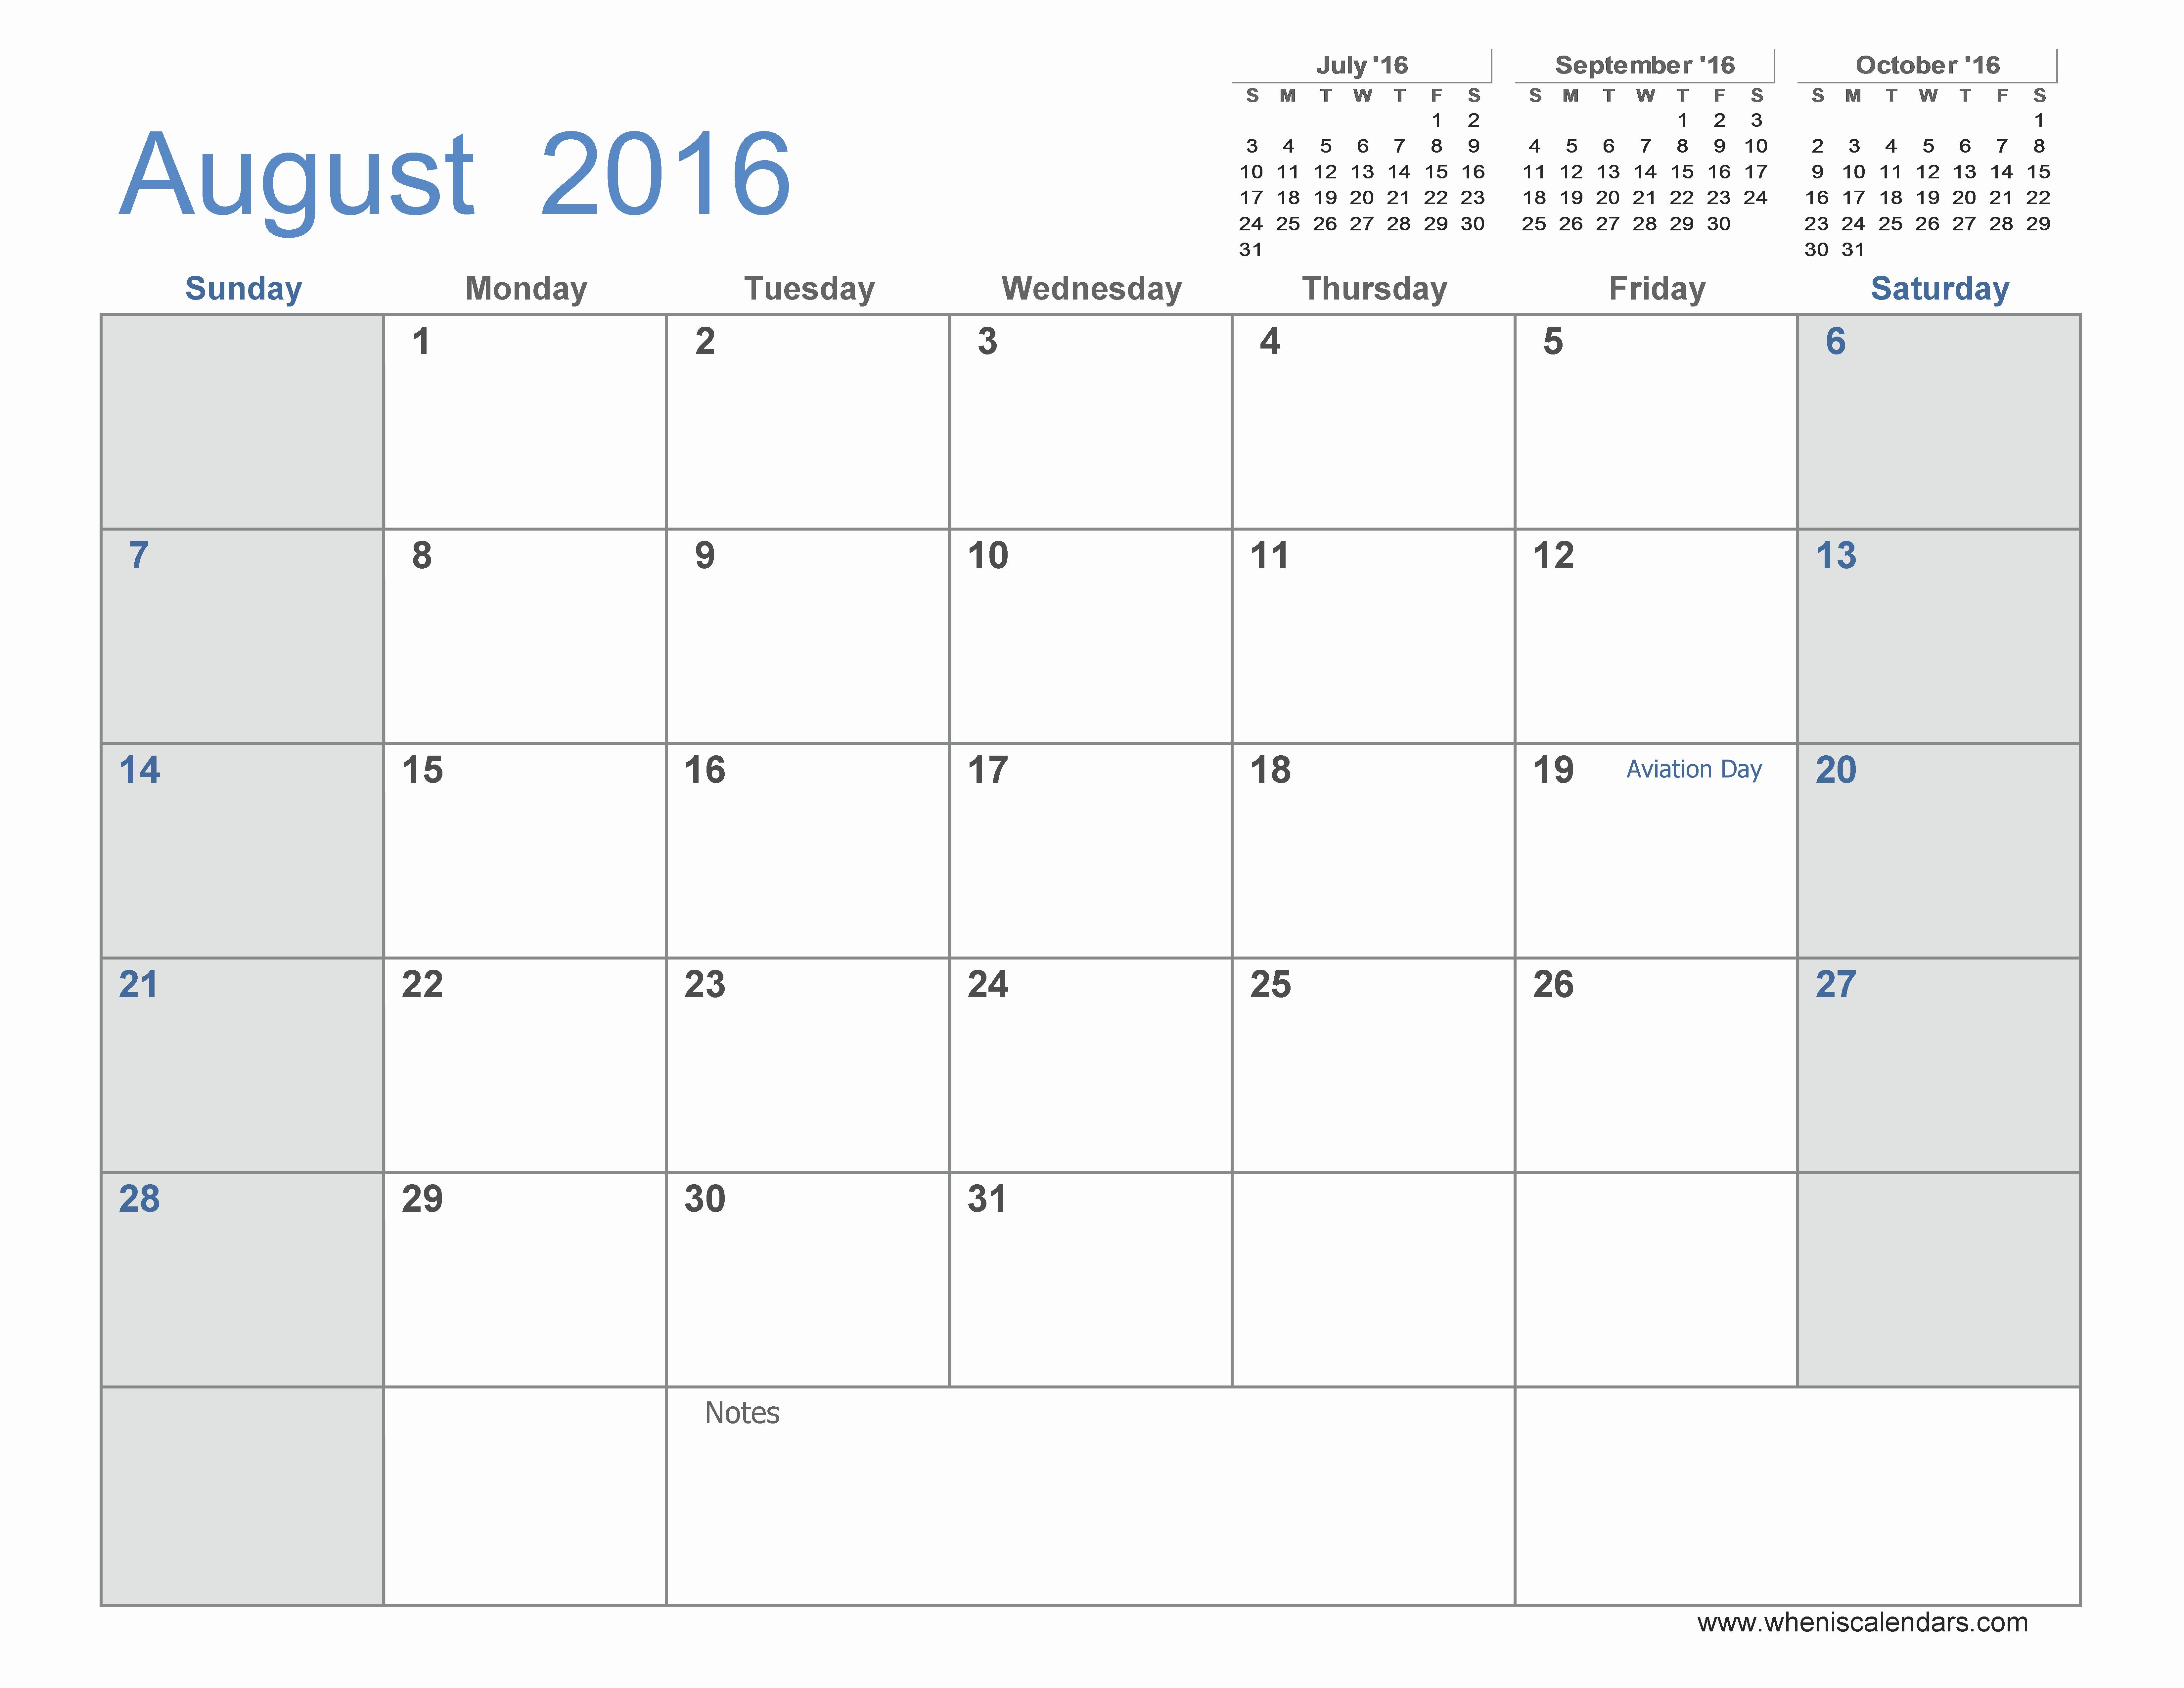 3 Month Calendar Printable 2016 Unique Calendar 2016 by Month to Print Aug 2016 Monthly Calendar